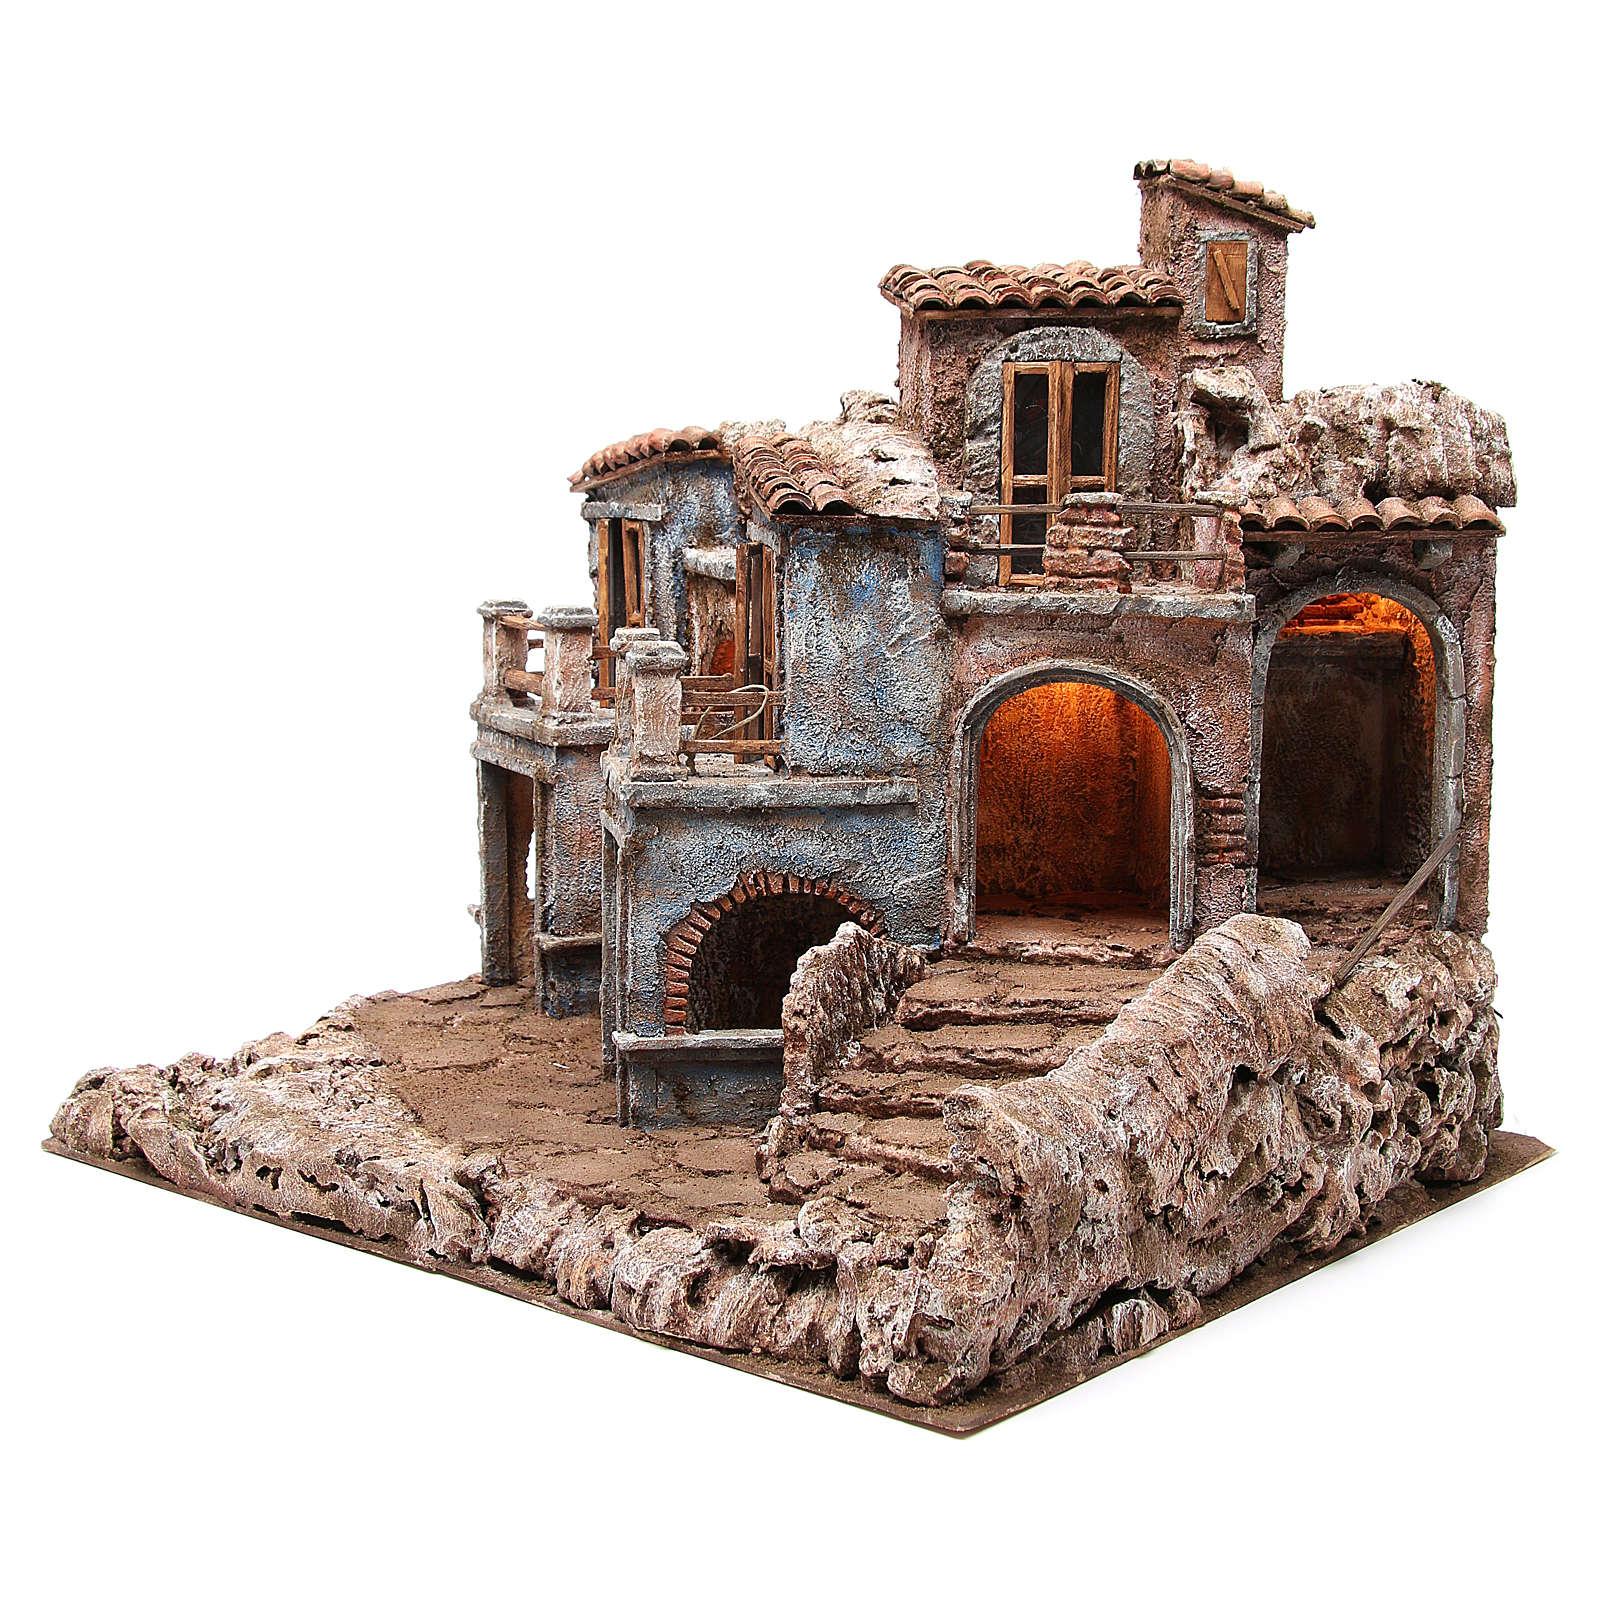 Aldea antigua del belén con cabaña 55x60x50 cm 4